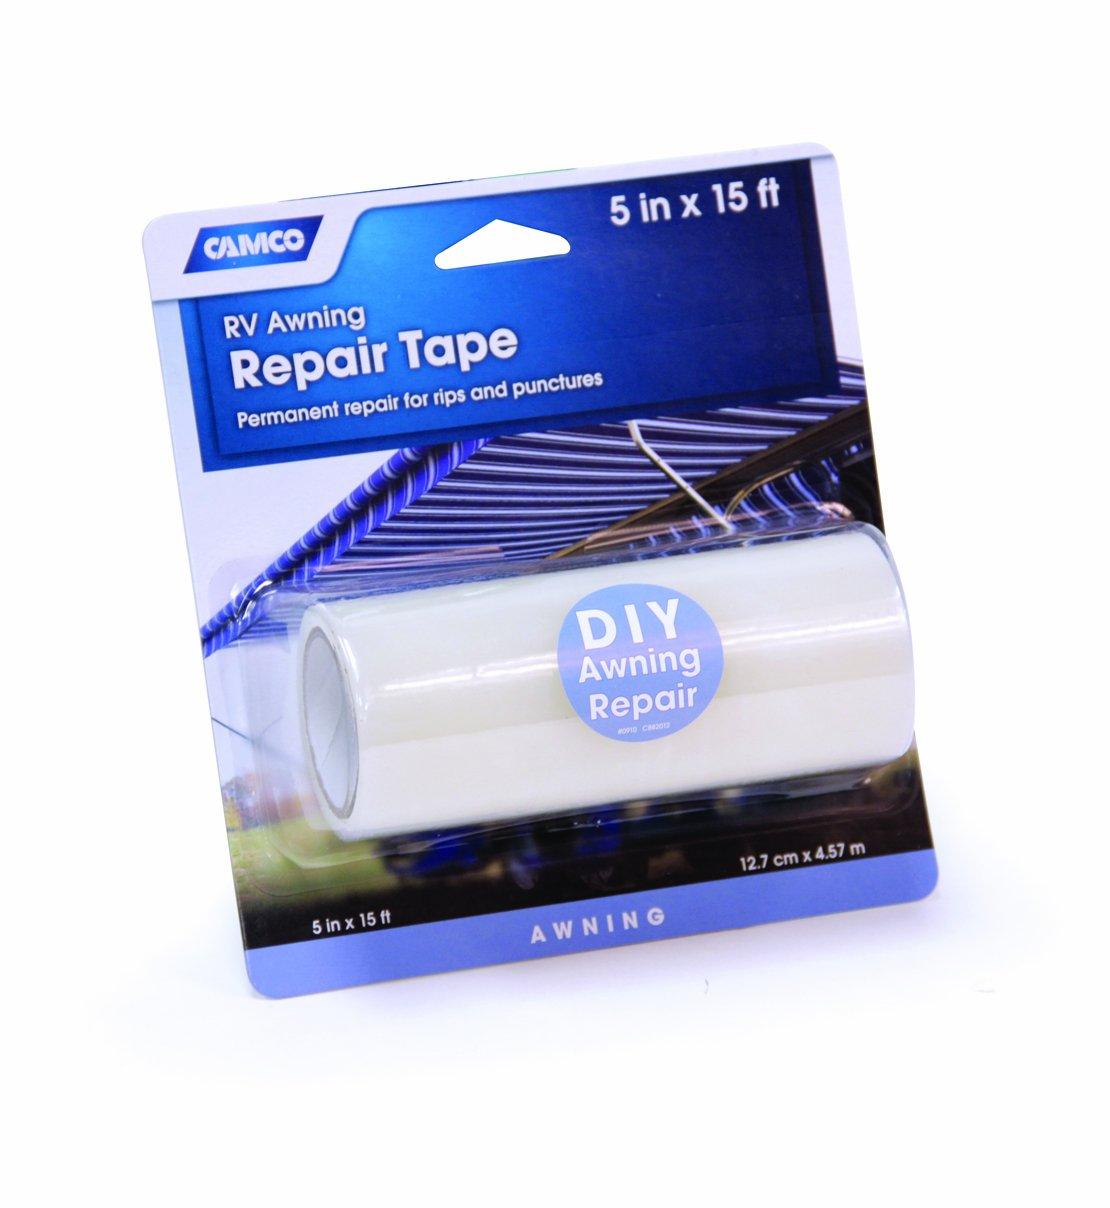 Camco 42623 5'' x 15' Awning Repair Tape